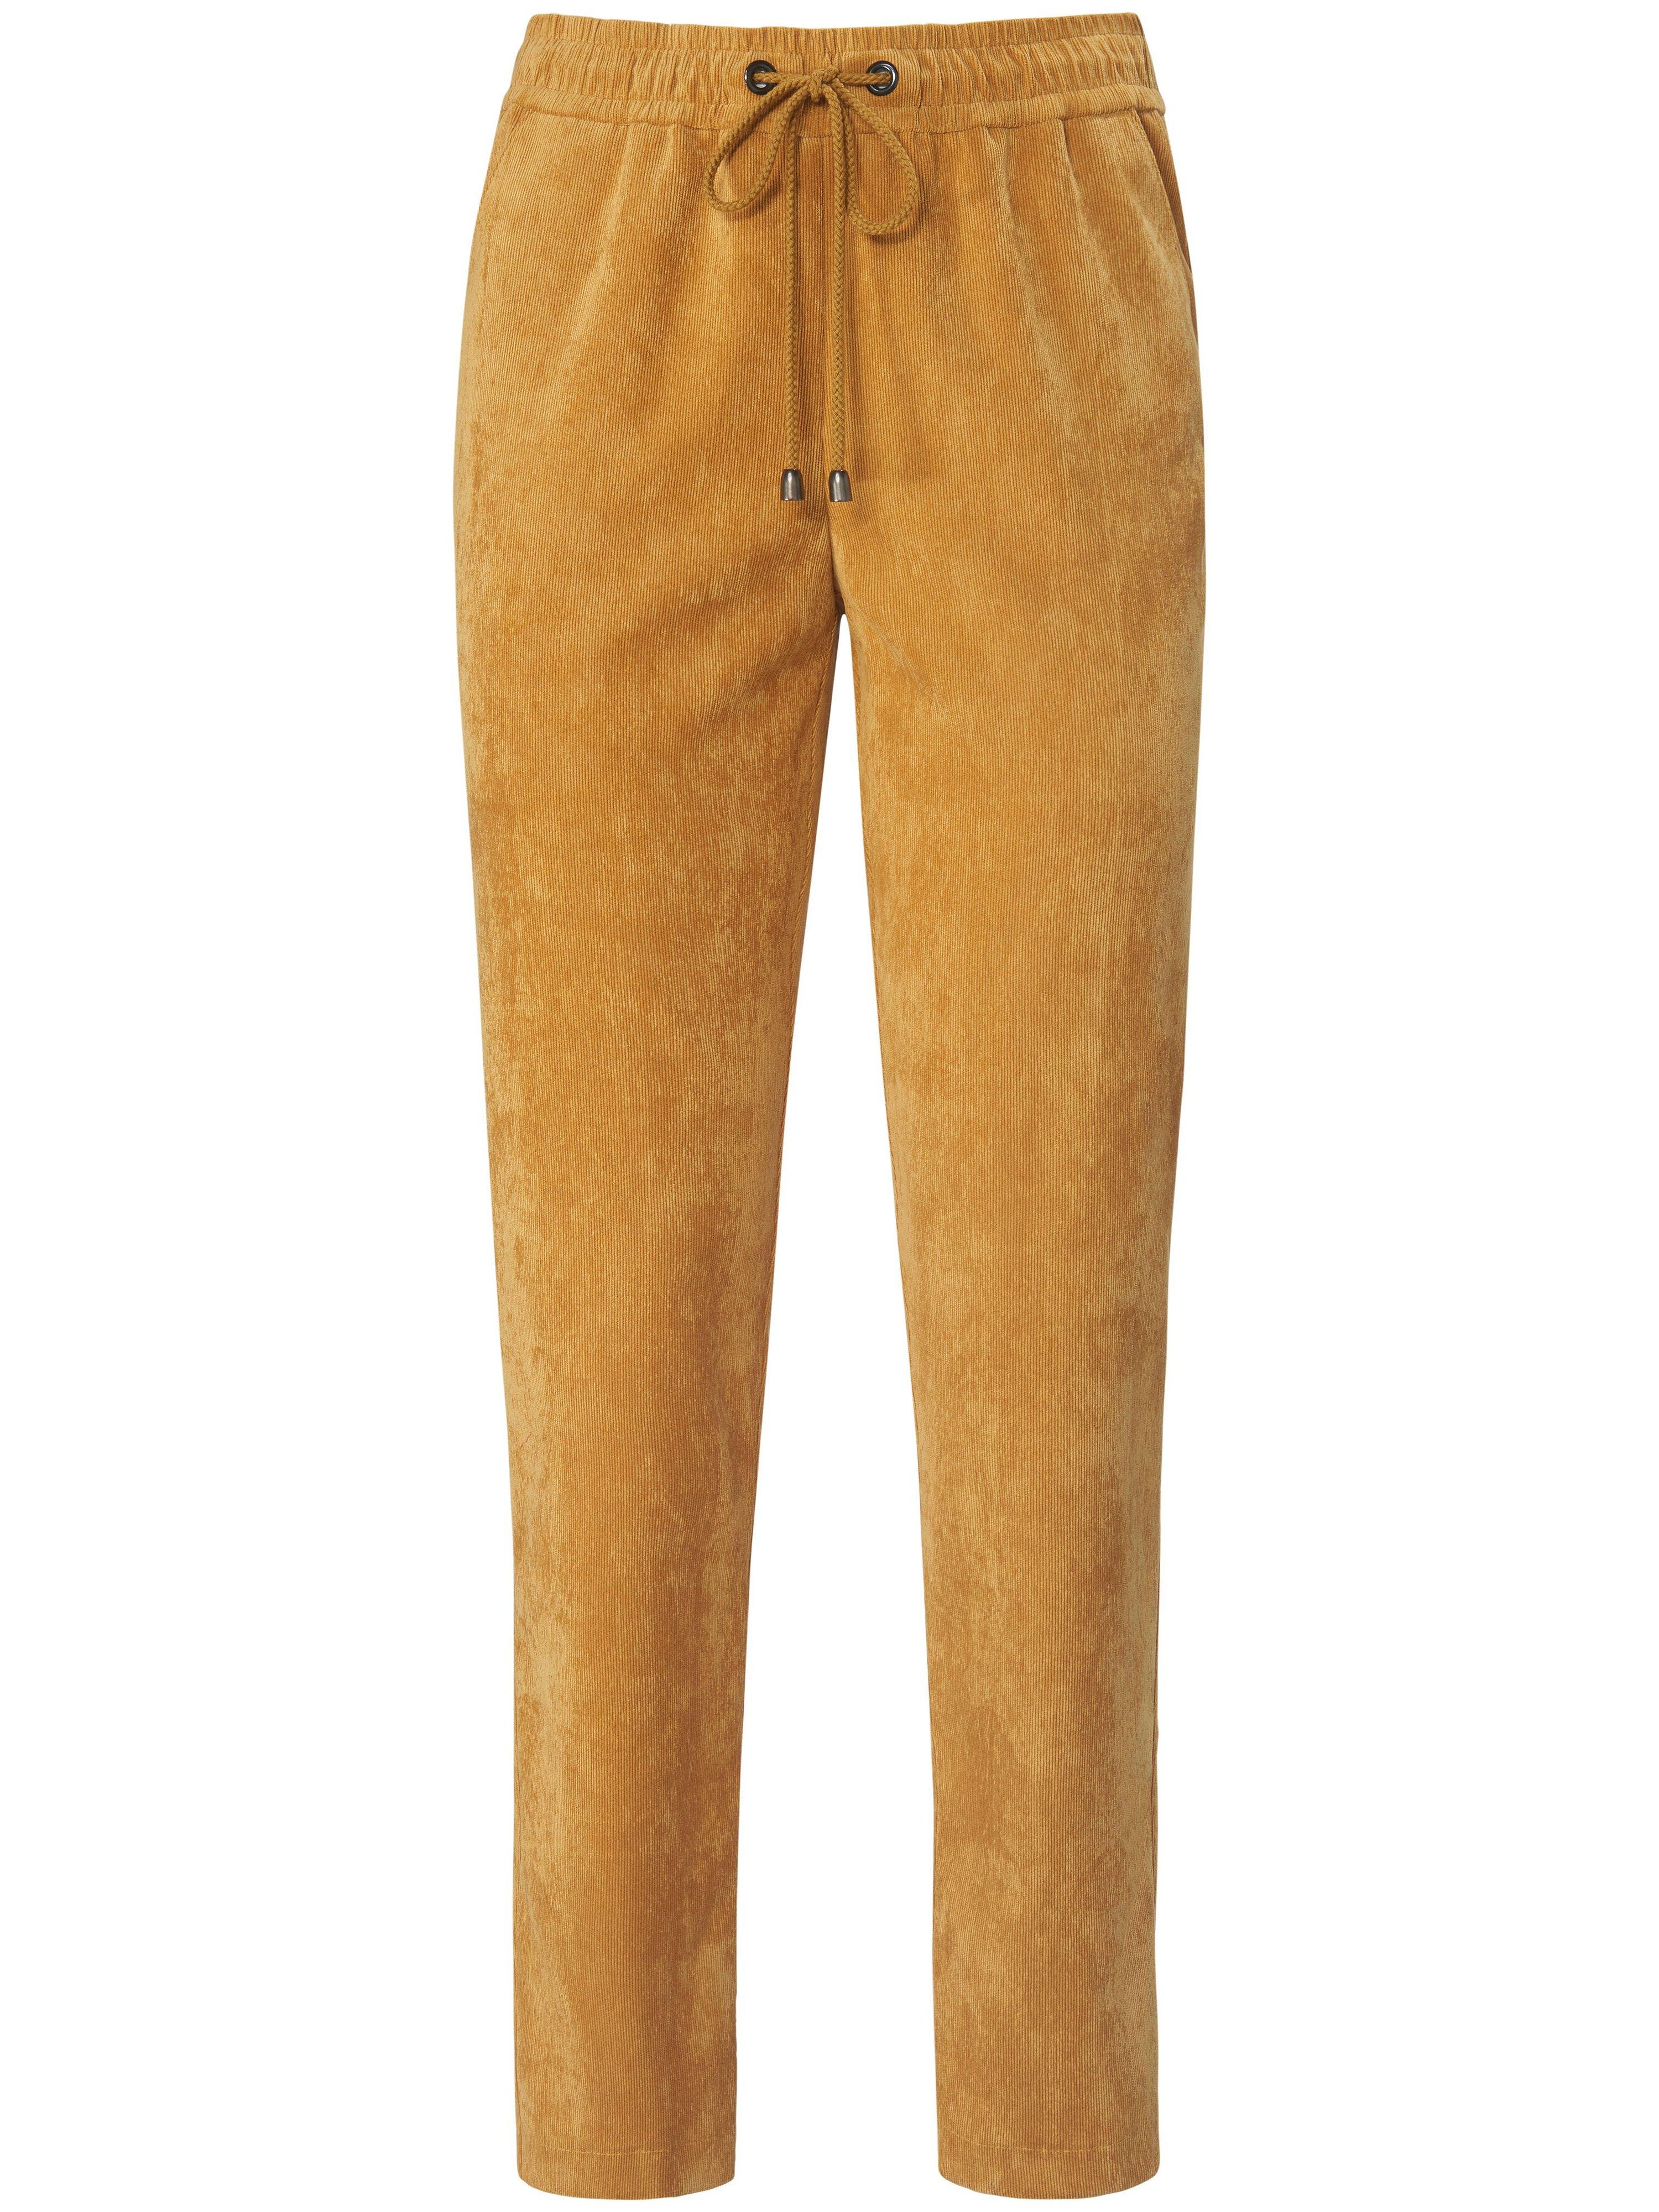 Enkellange fijncord broek pasvorm Barbara Van Peter Hahn geel